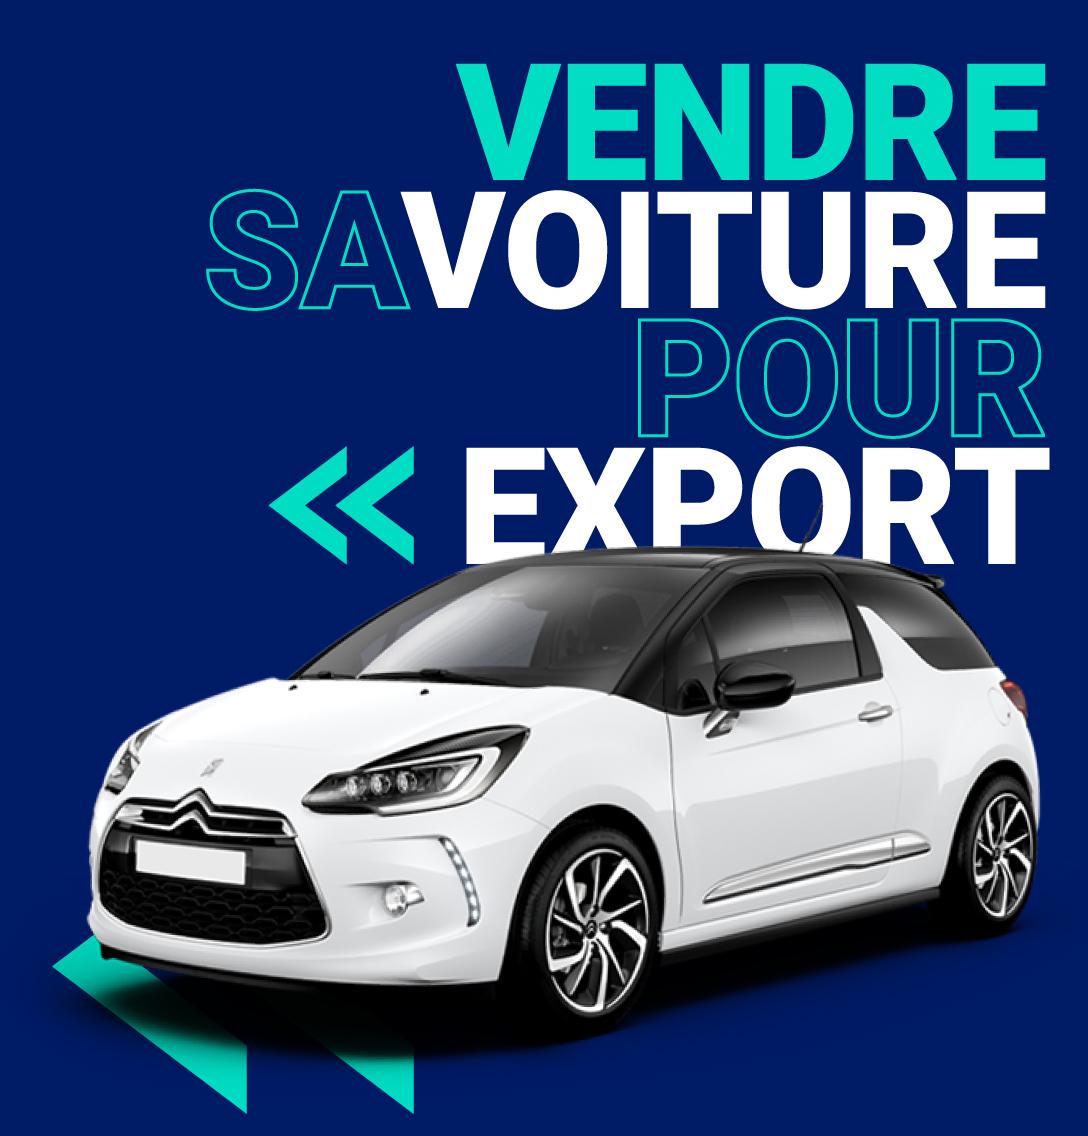 Vendre sa voiture export